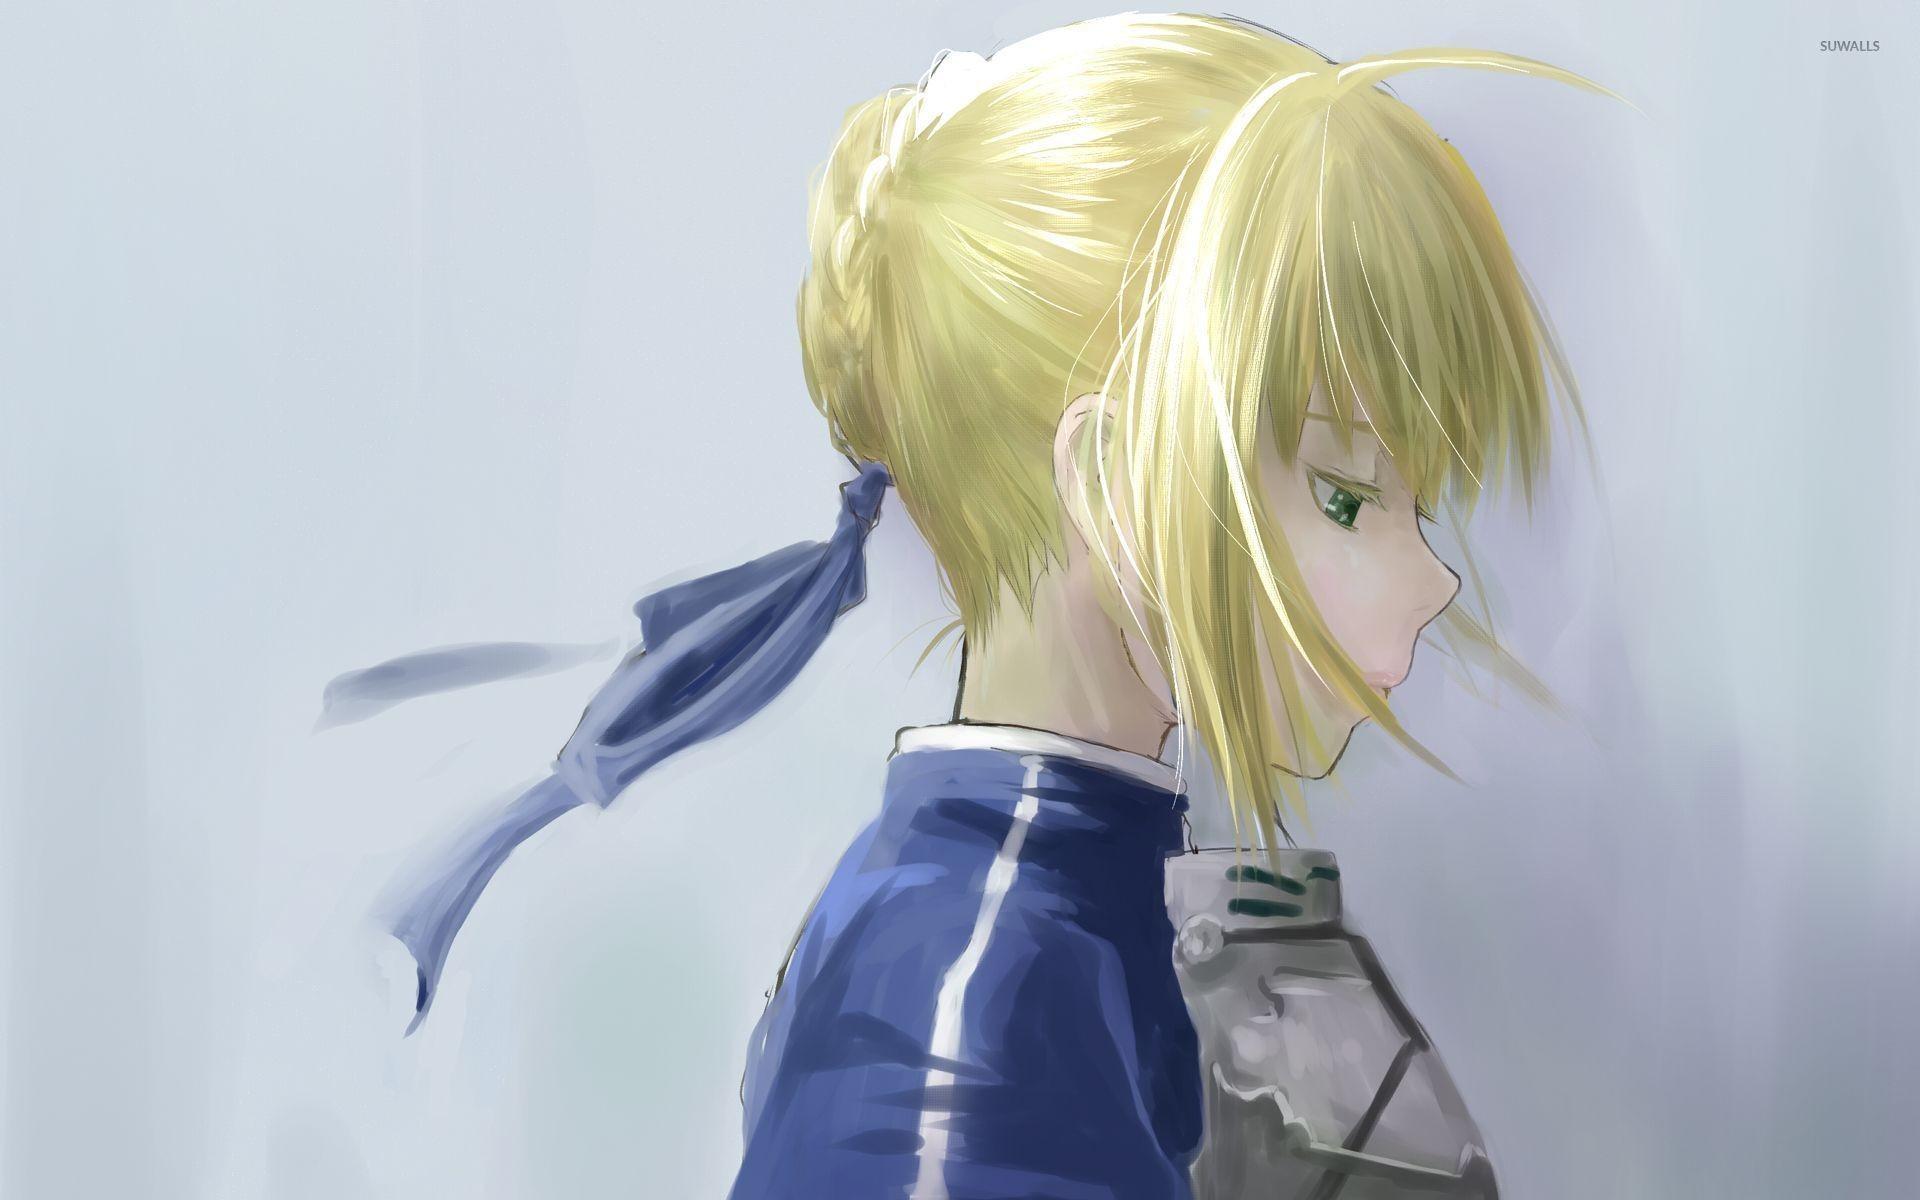 Res: 1920x1200, Sad blonde girl [2] wallpaper